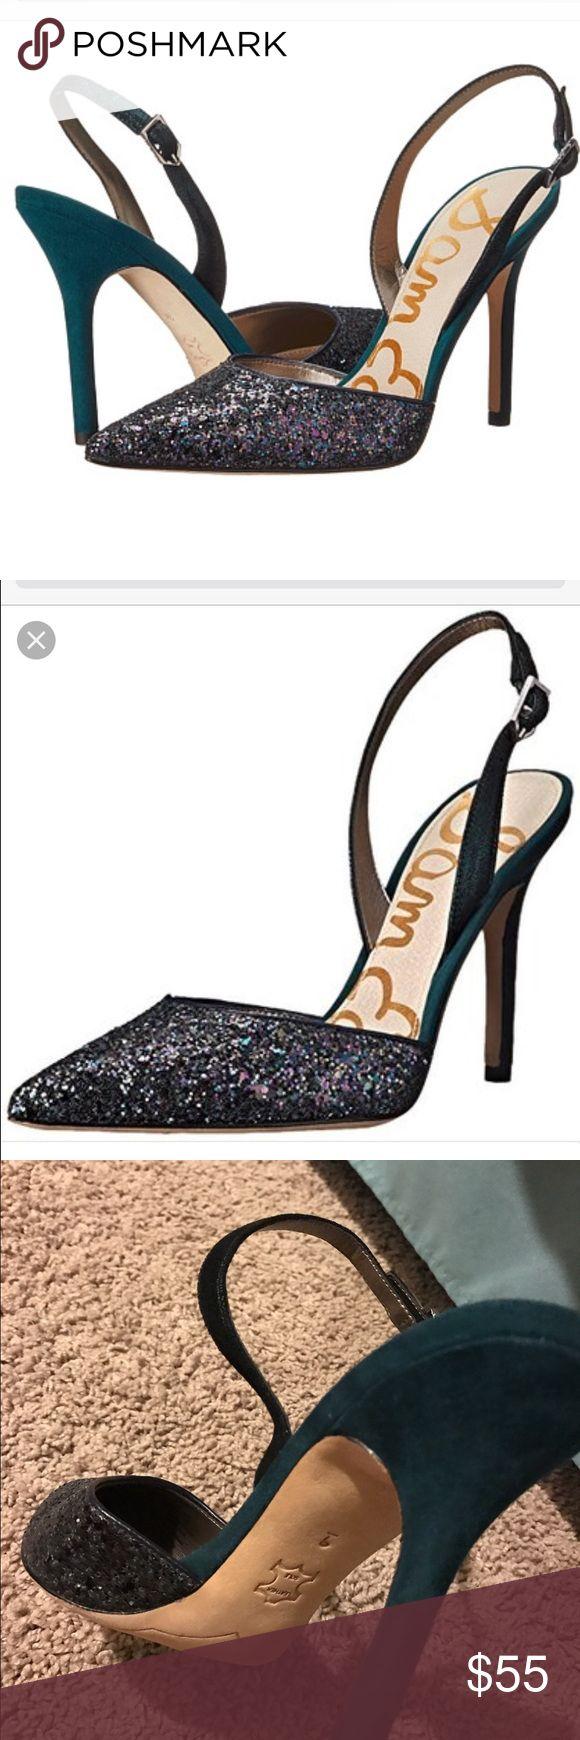 Selling this Sam Edelman pointy toe glitter Dora pump/sling new on Poshmark! My username is: bacictanya. #shopmycloset #poshmark #fashion #shopping #style #forsale #Sam Edelman #Shoes